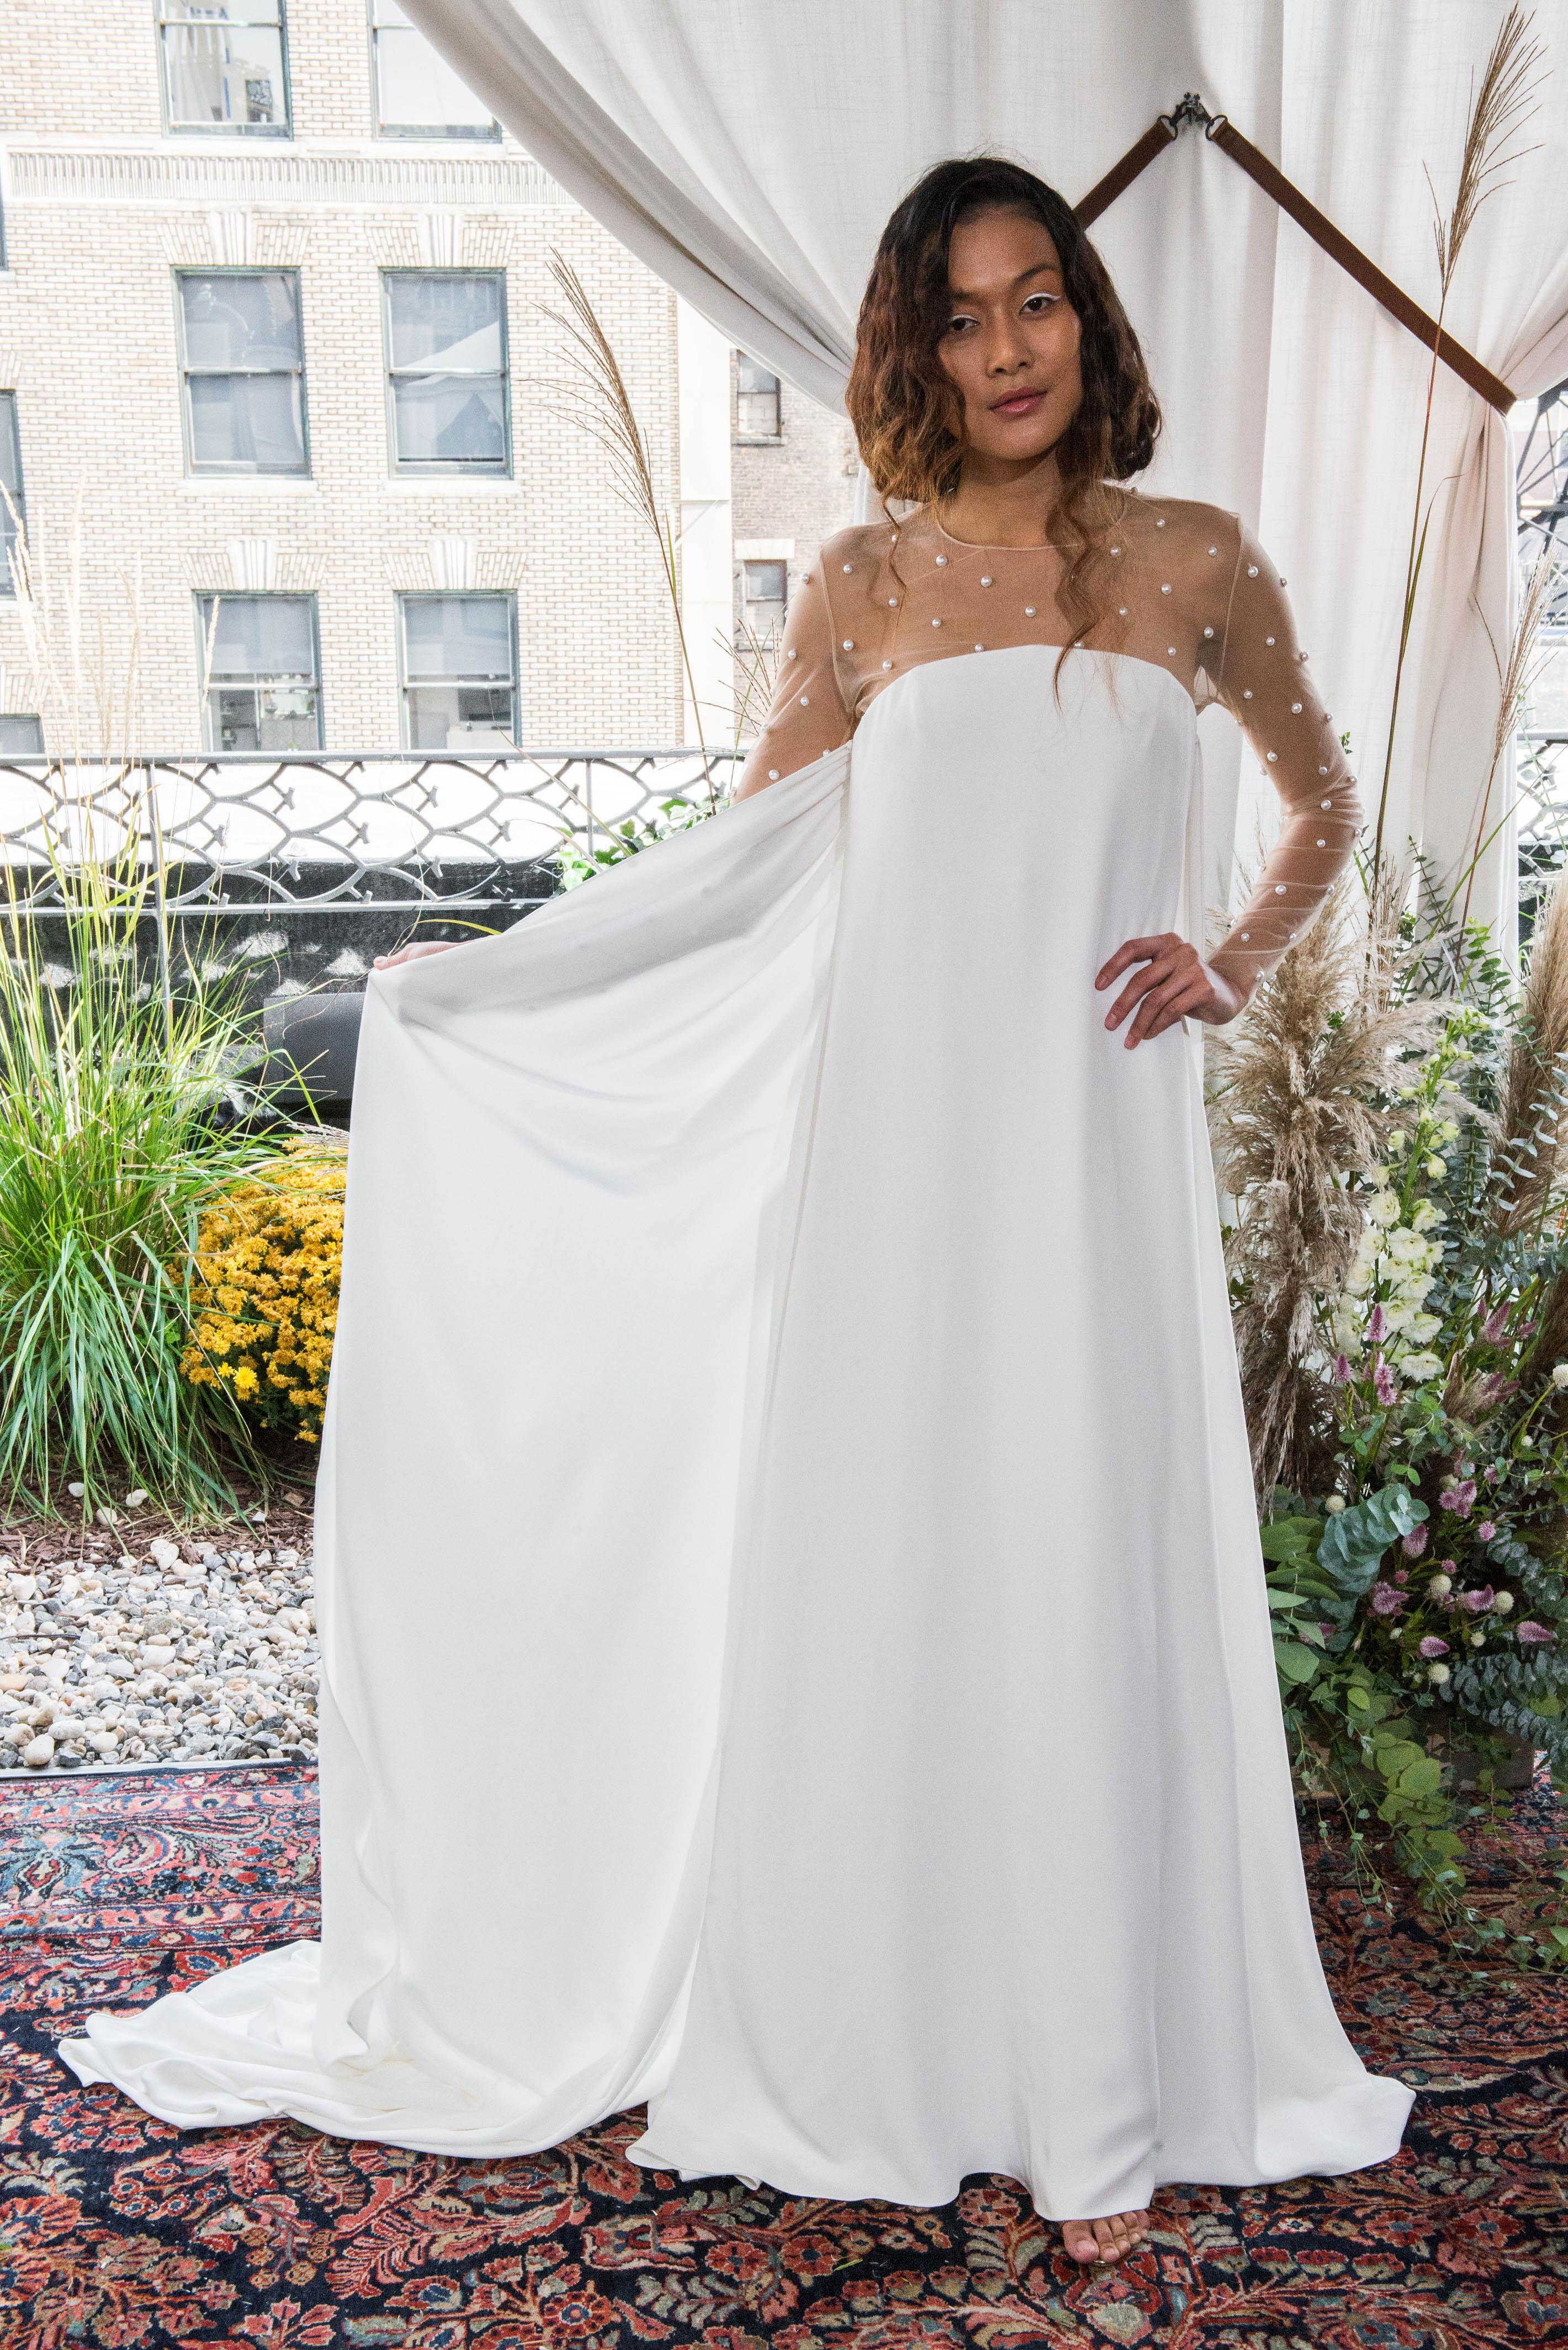 alexandra grecco wedding dress fall 2018 long sleeves illusion column